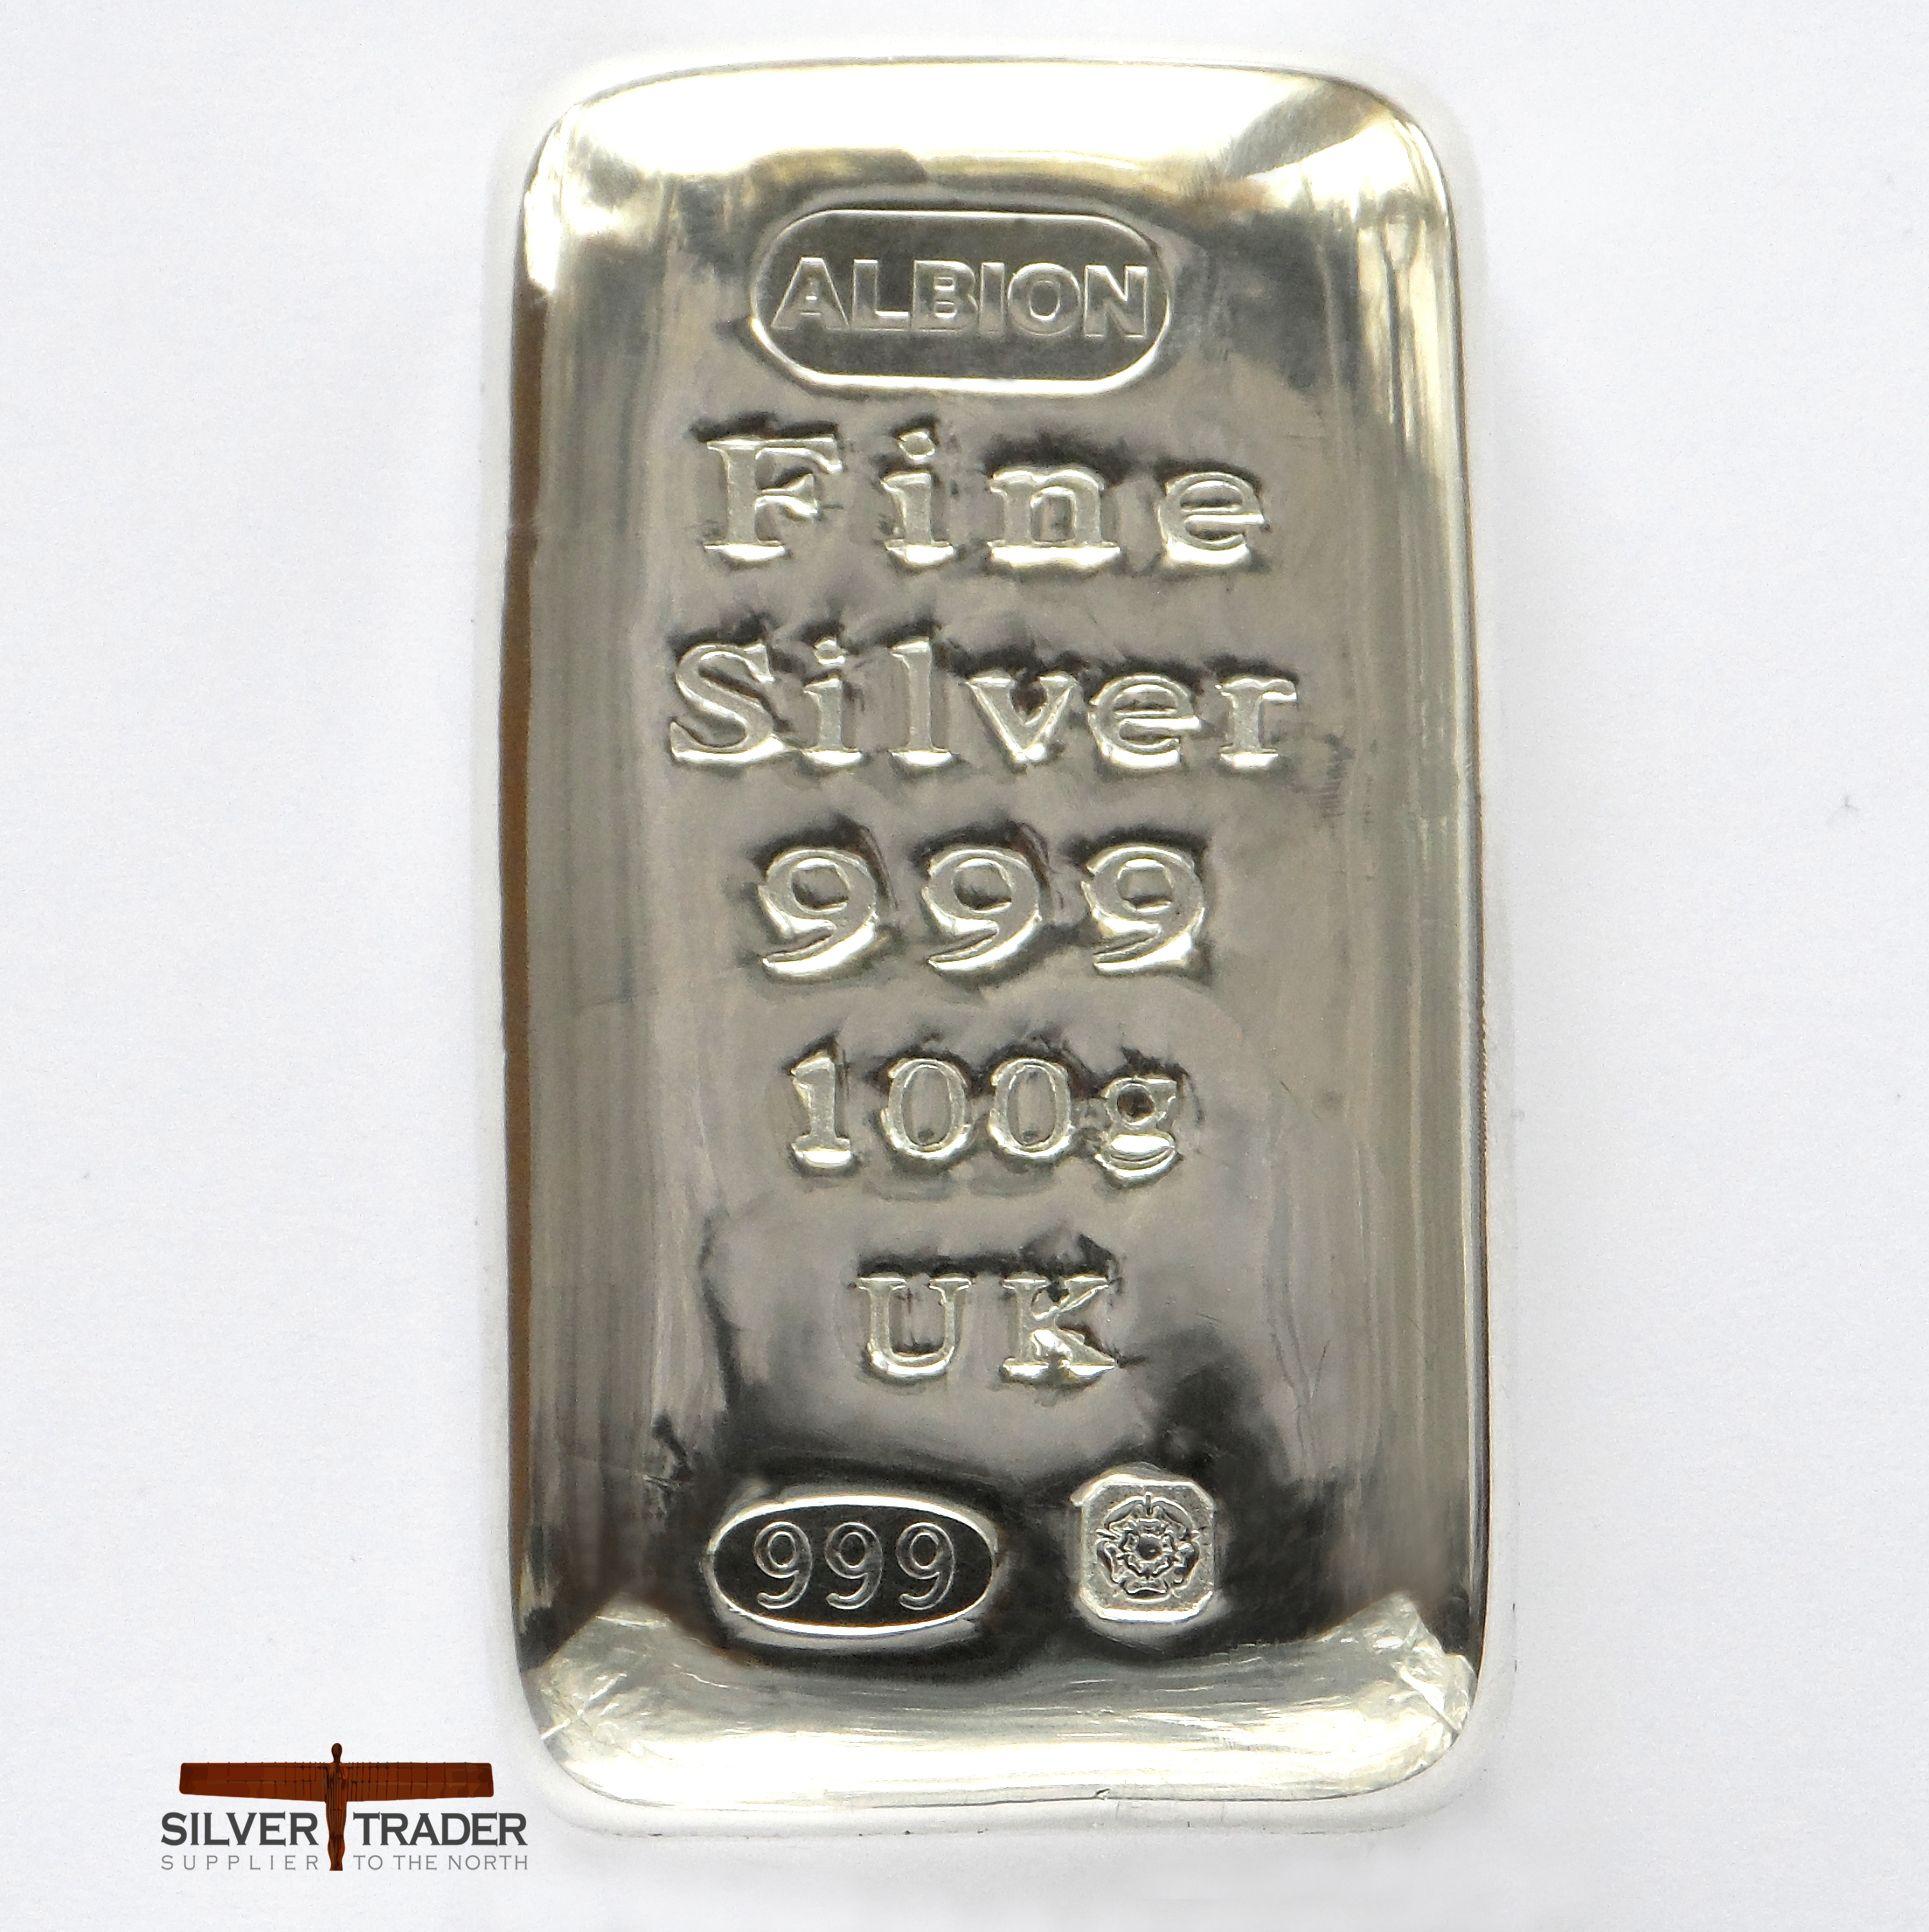 2020 Albion 100 Gram Trademarked 999 Silver Bullion Bar Silver Bullion Silver Bullion Coins Bullion